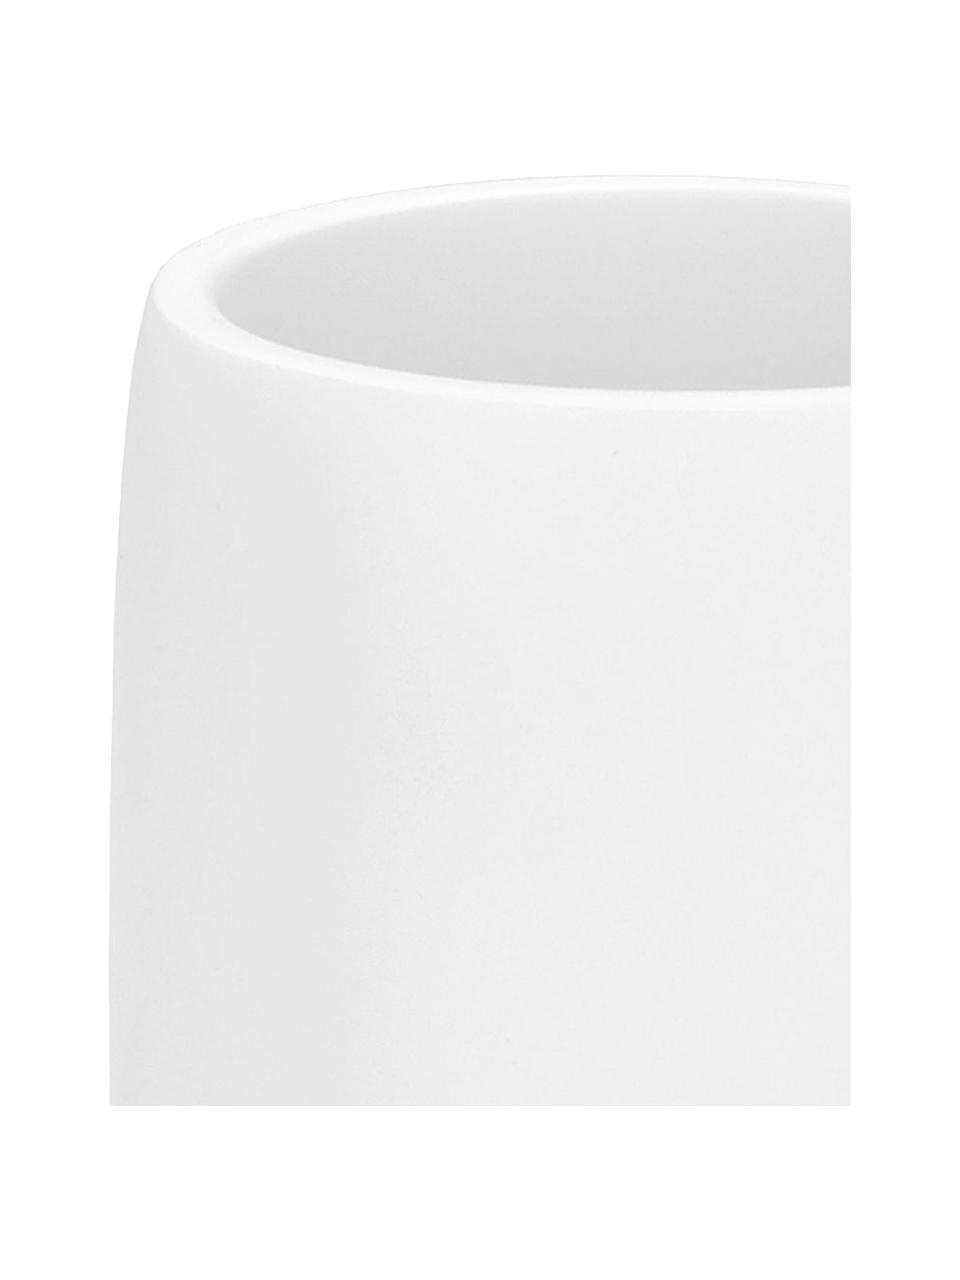 Zahnputzbecher Angel, Keramik, Weiß, Ø 7 x H 11 cm